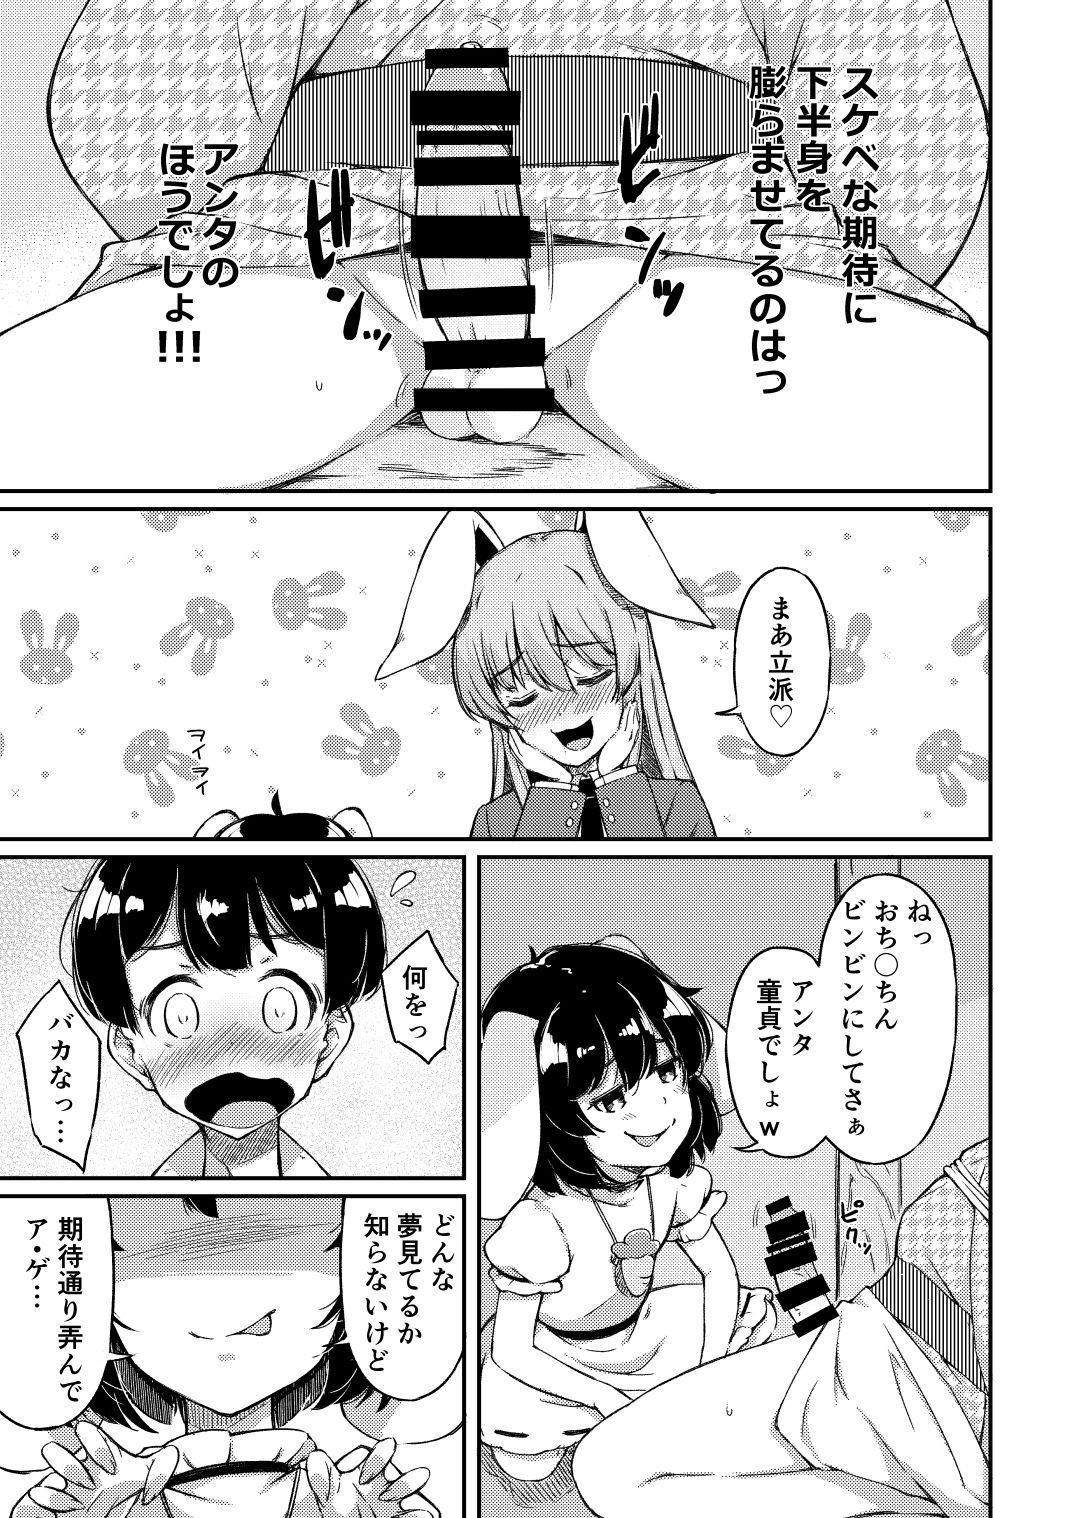 UdoTewi no, Gochisousama! 3